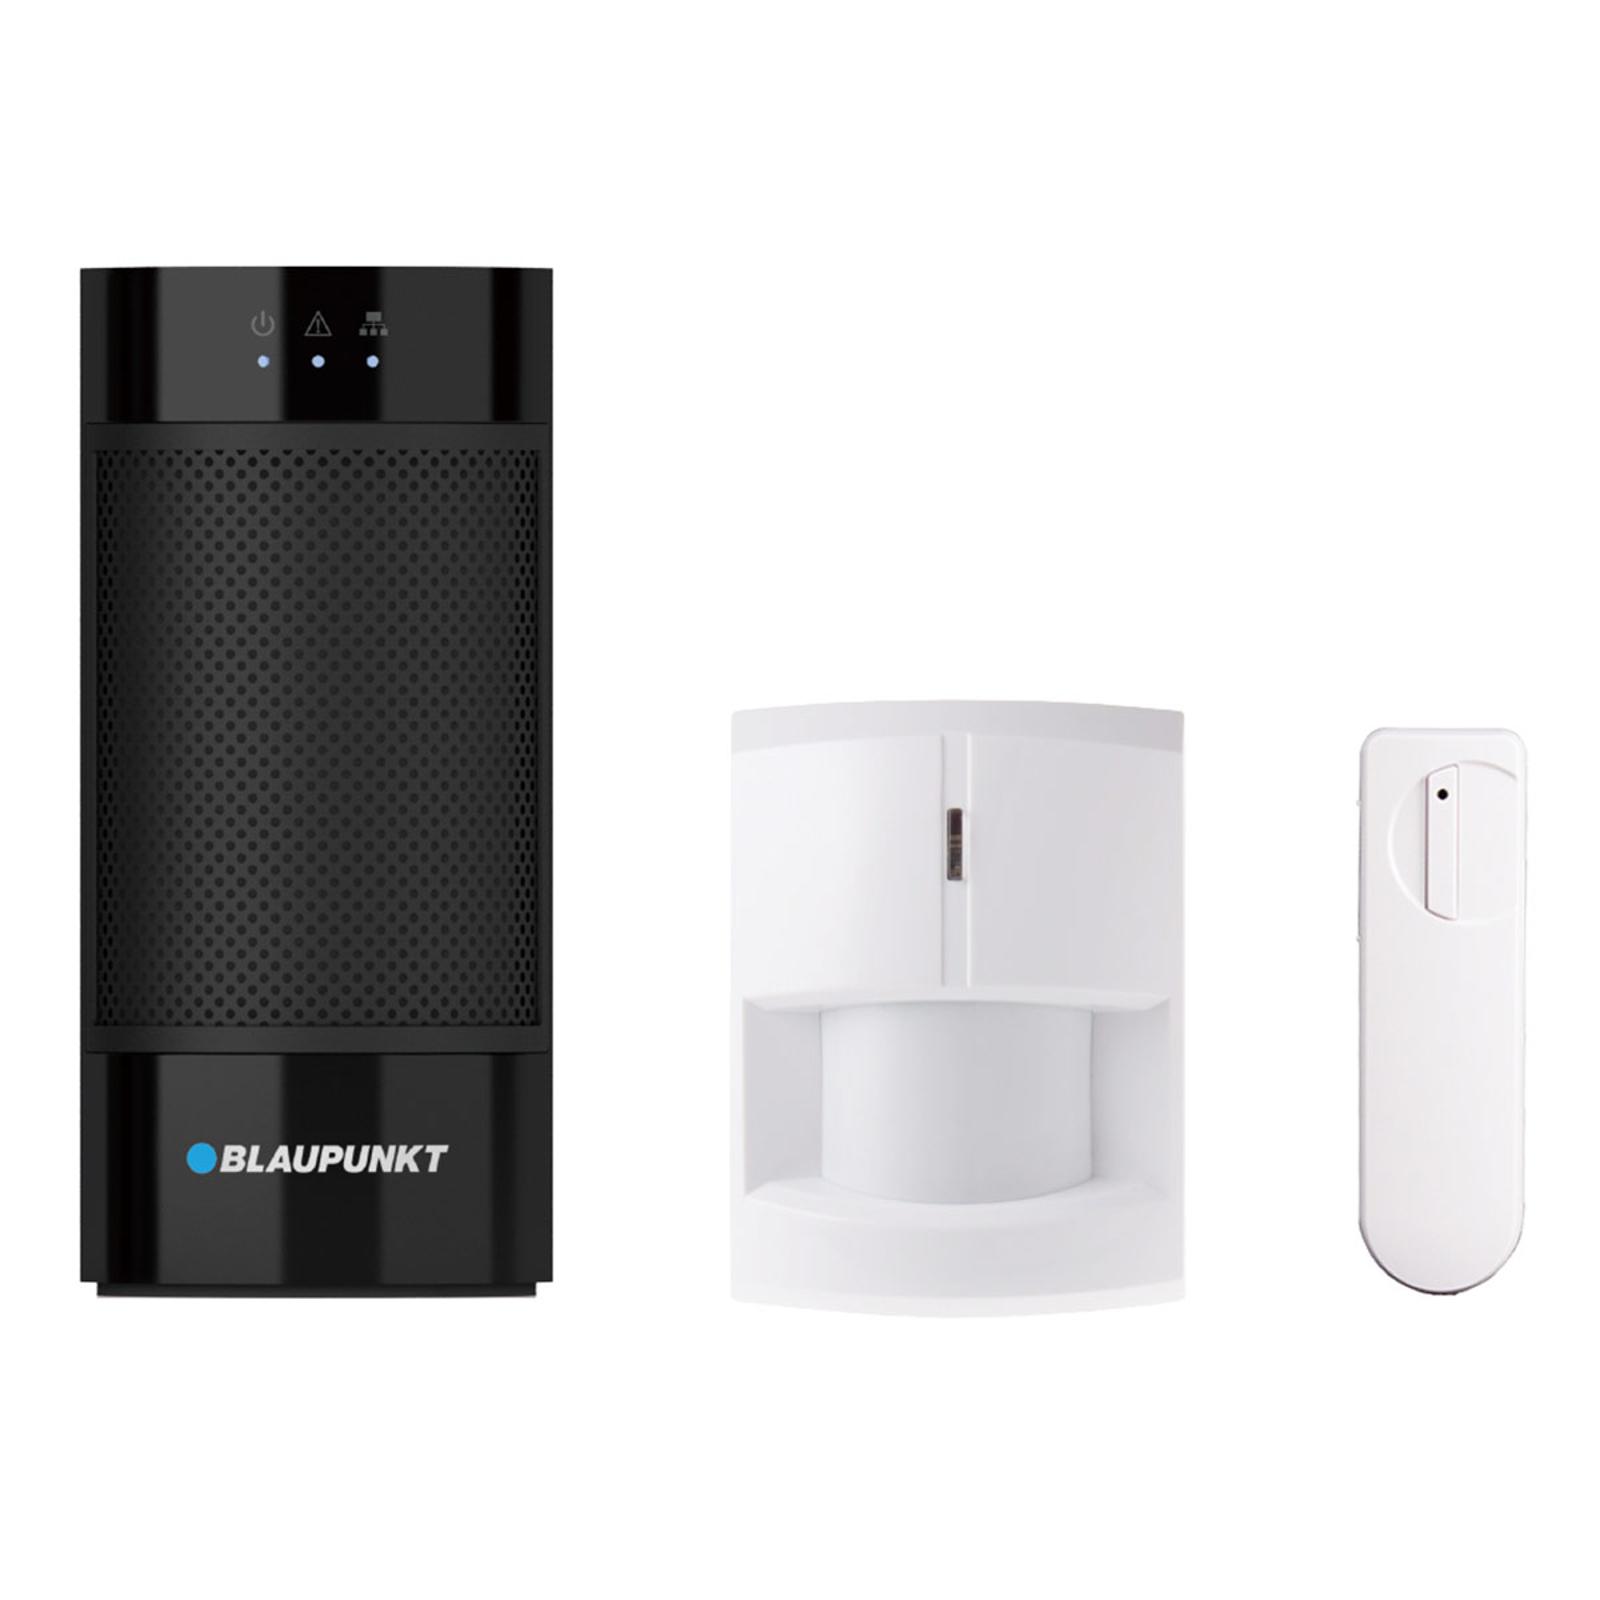 Blaupunkt Q3000 Smart Home Alarm startsett